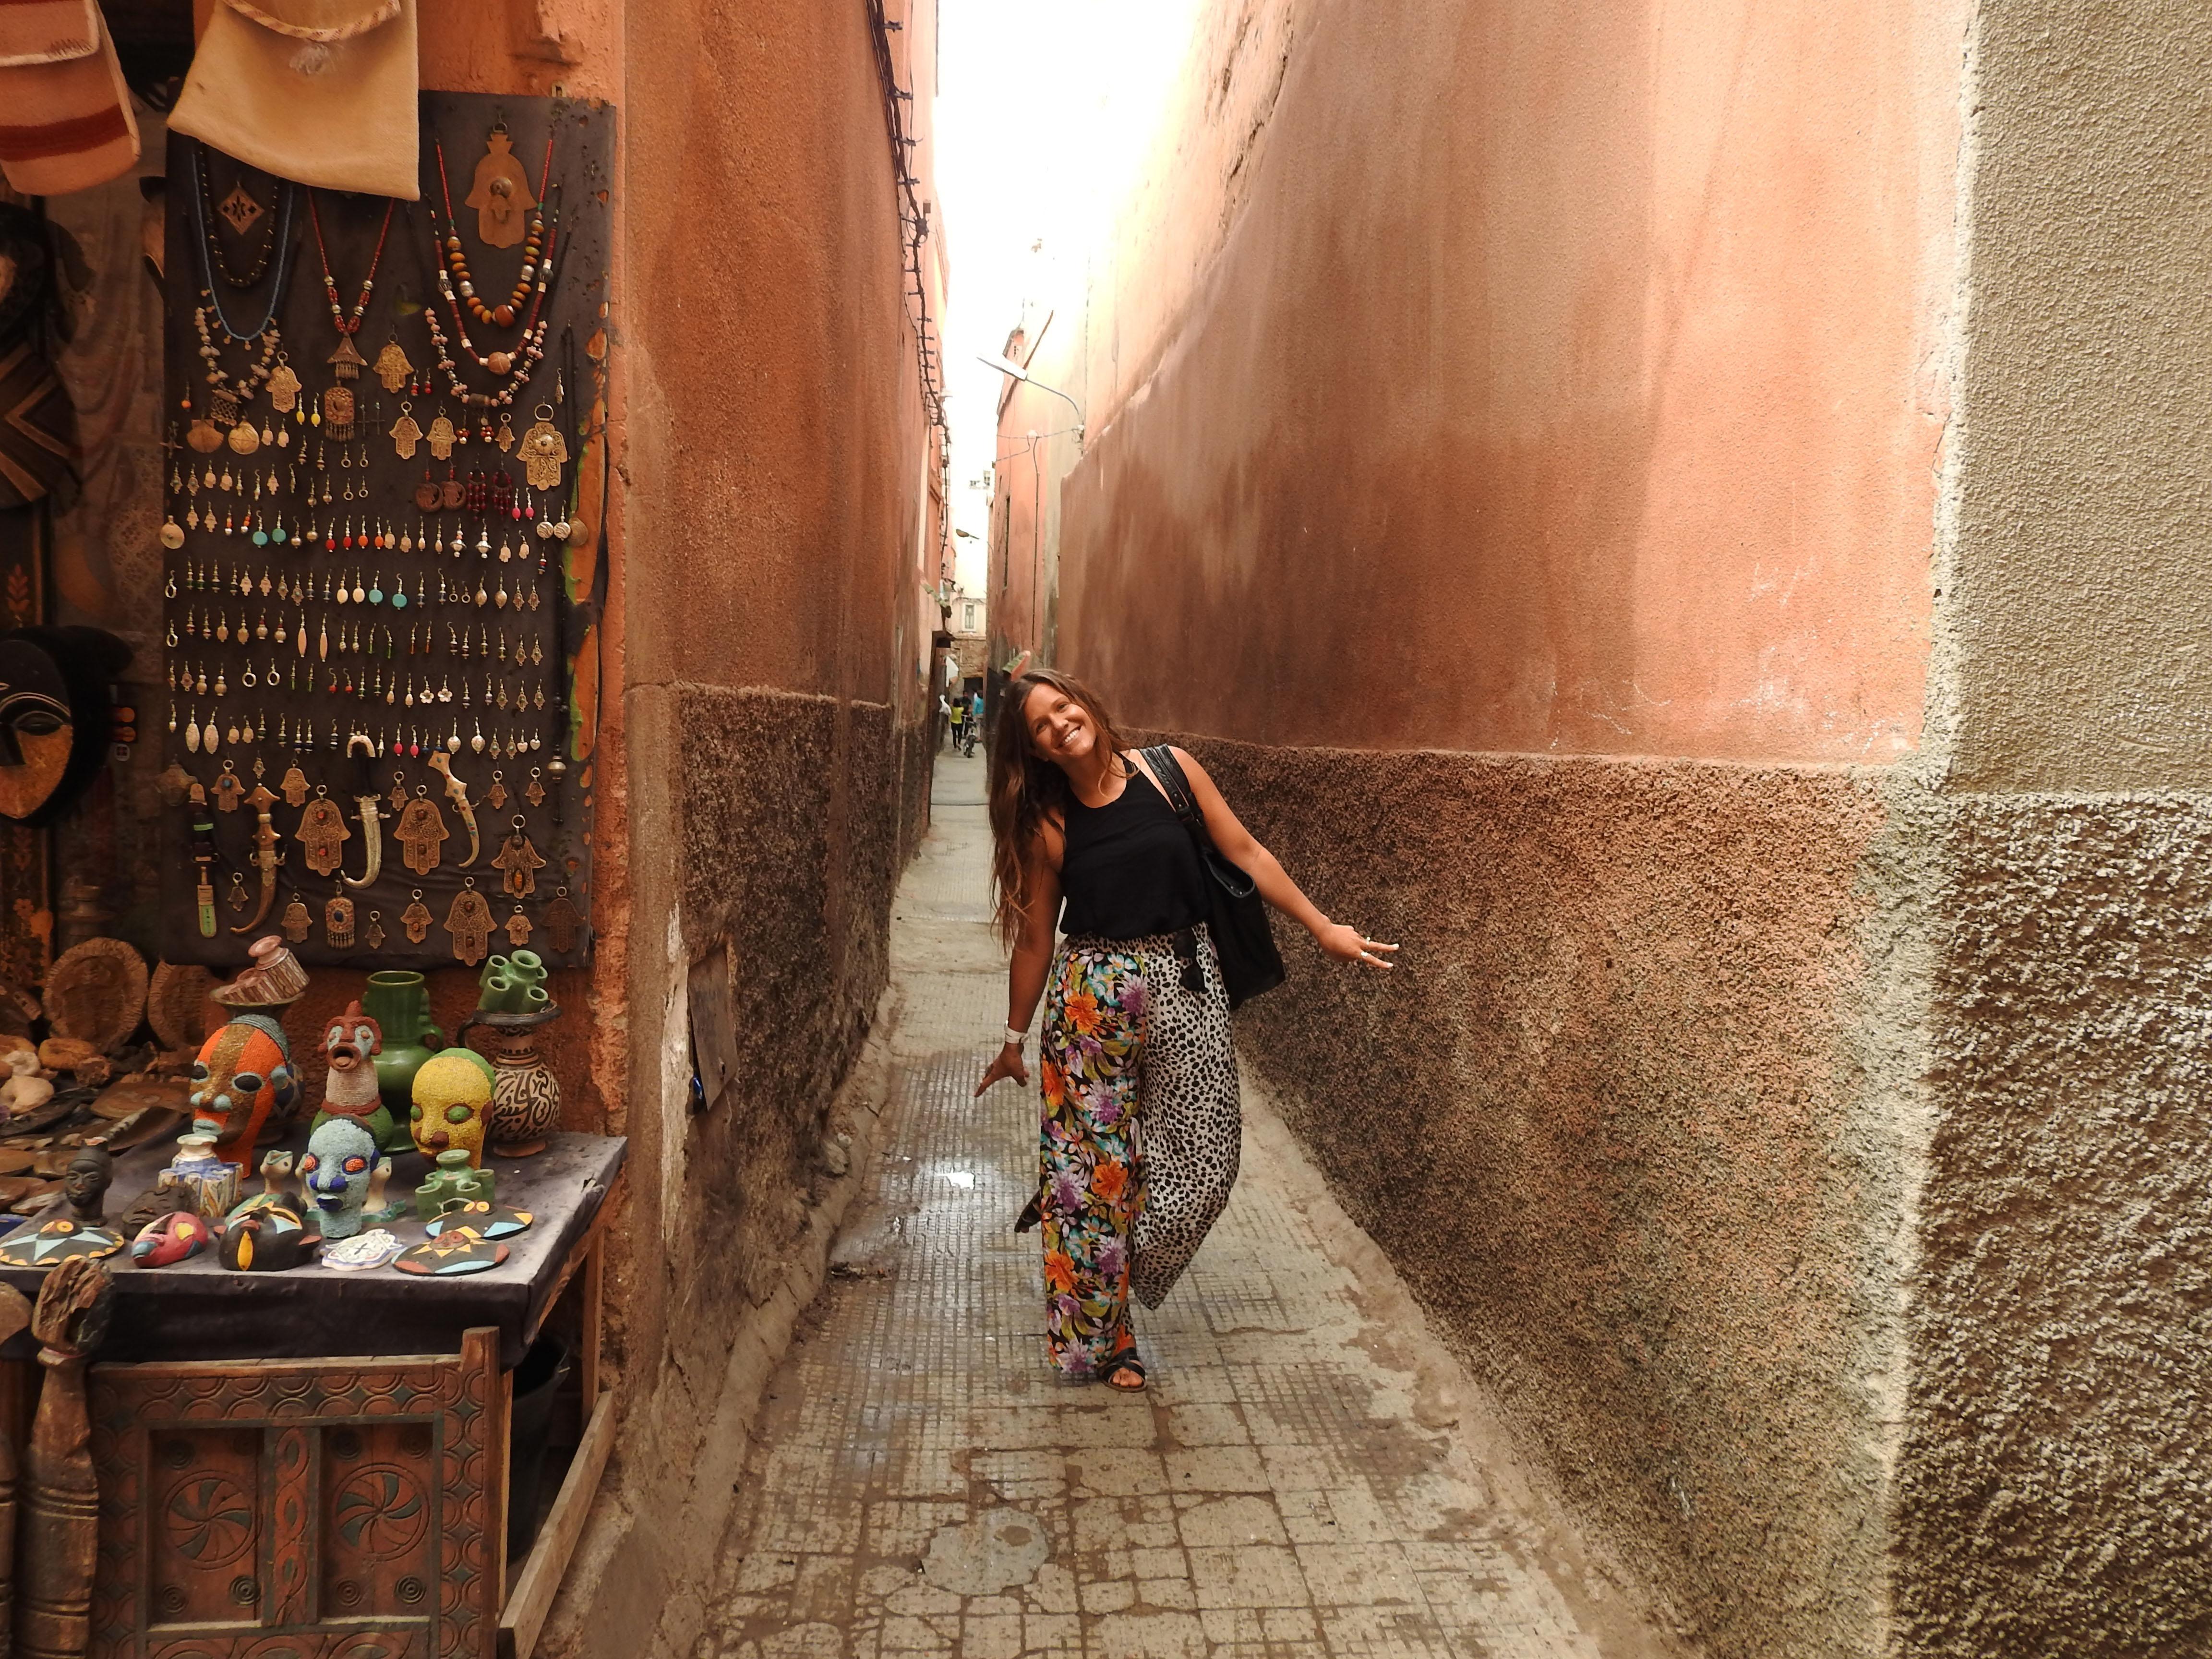 Mazelike alleys